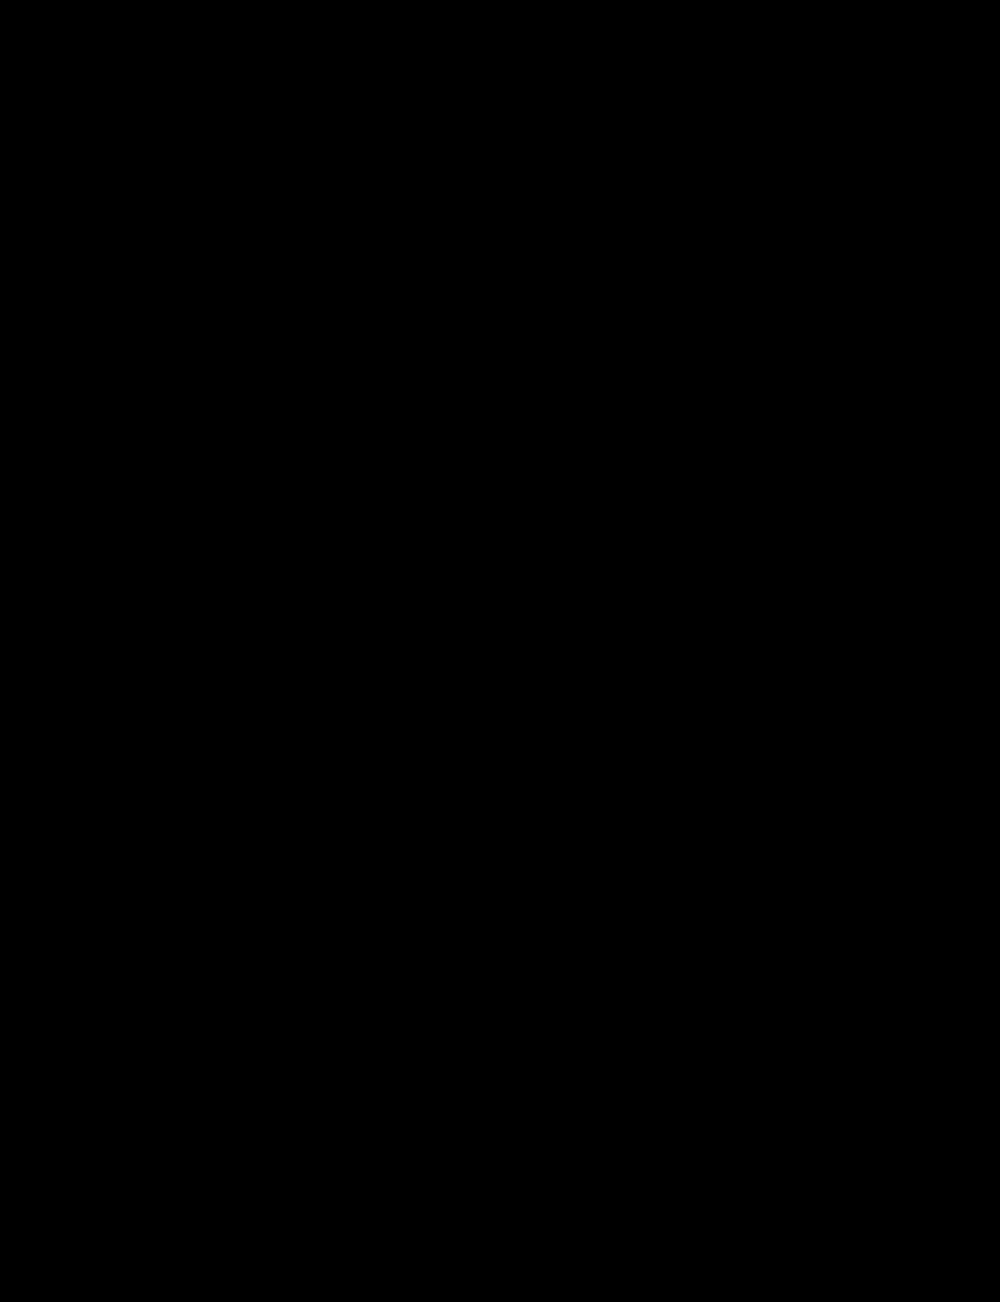 Brun reflets chocolats